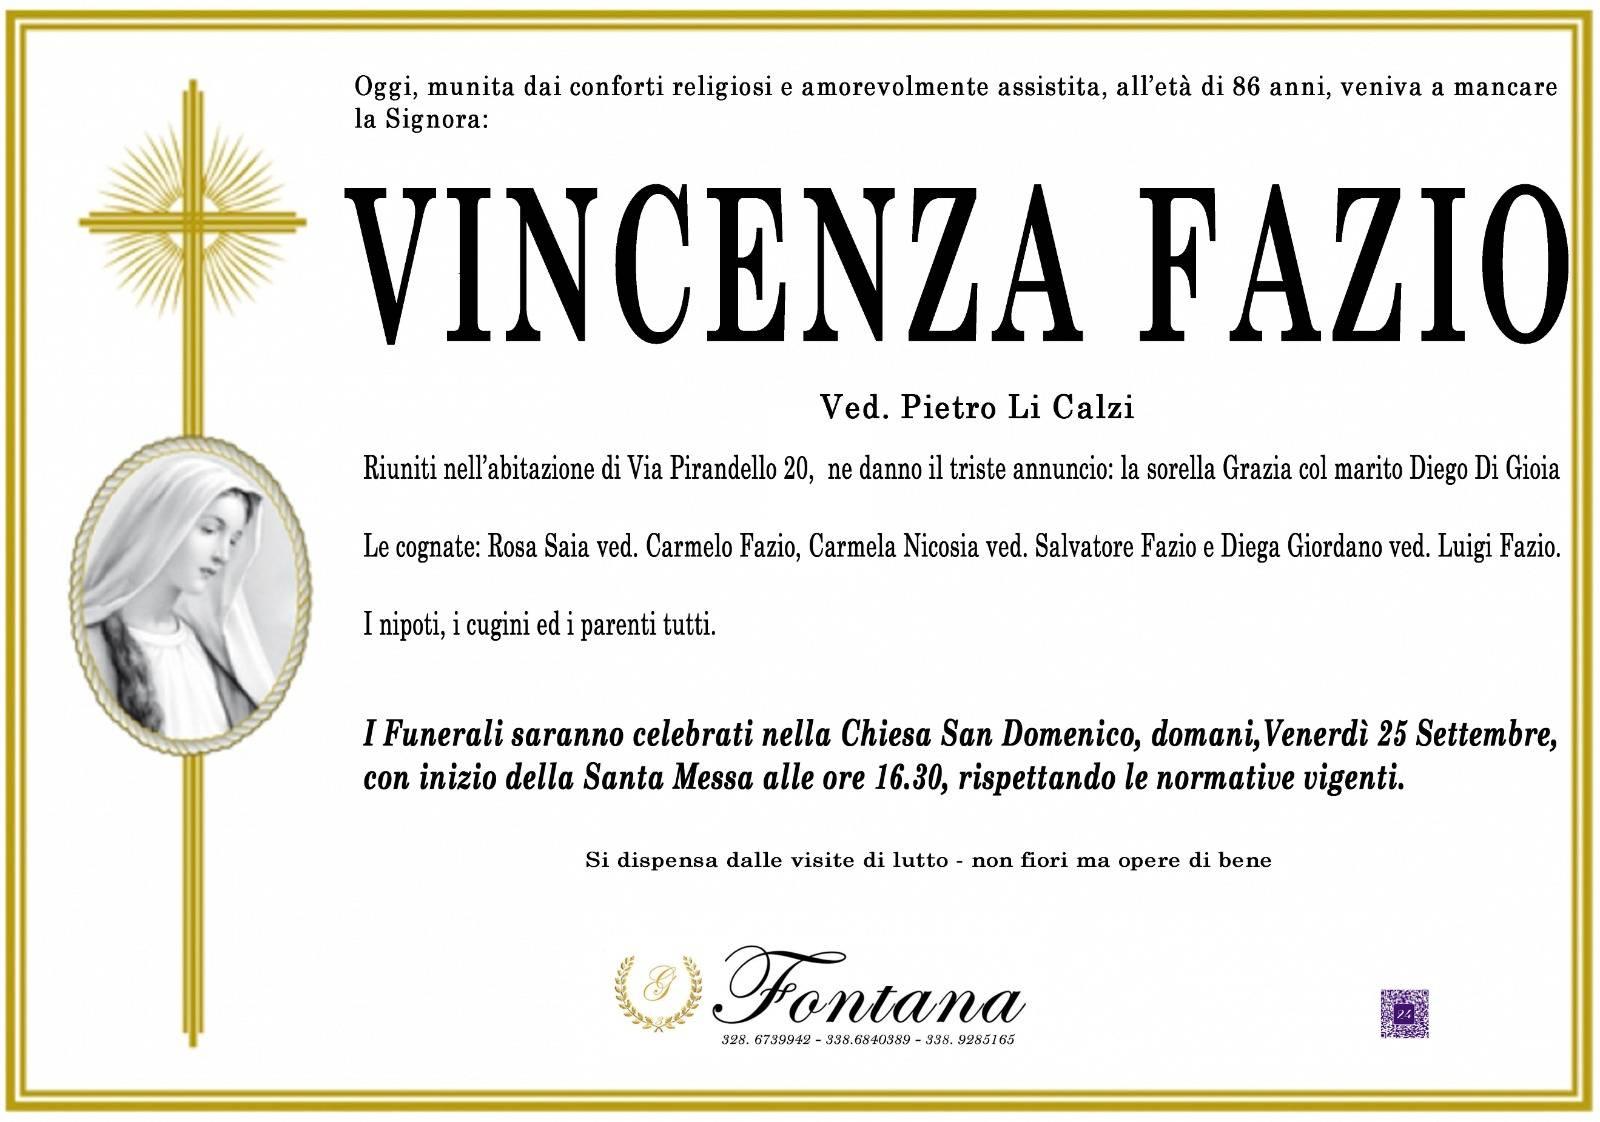 Vincenza Fazio